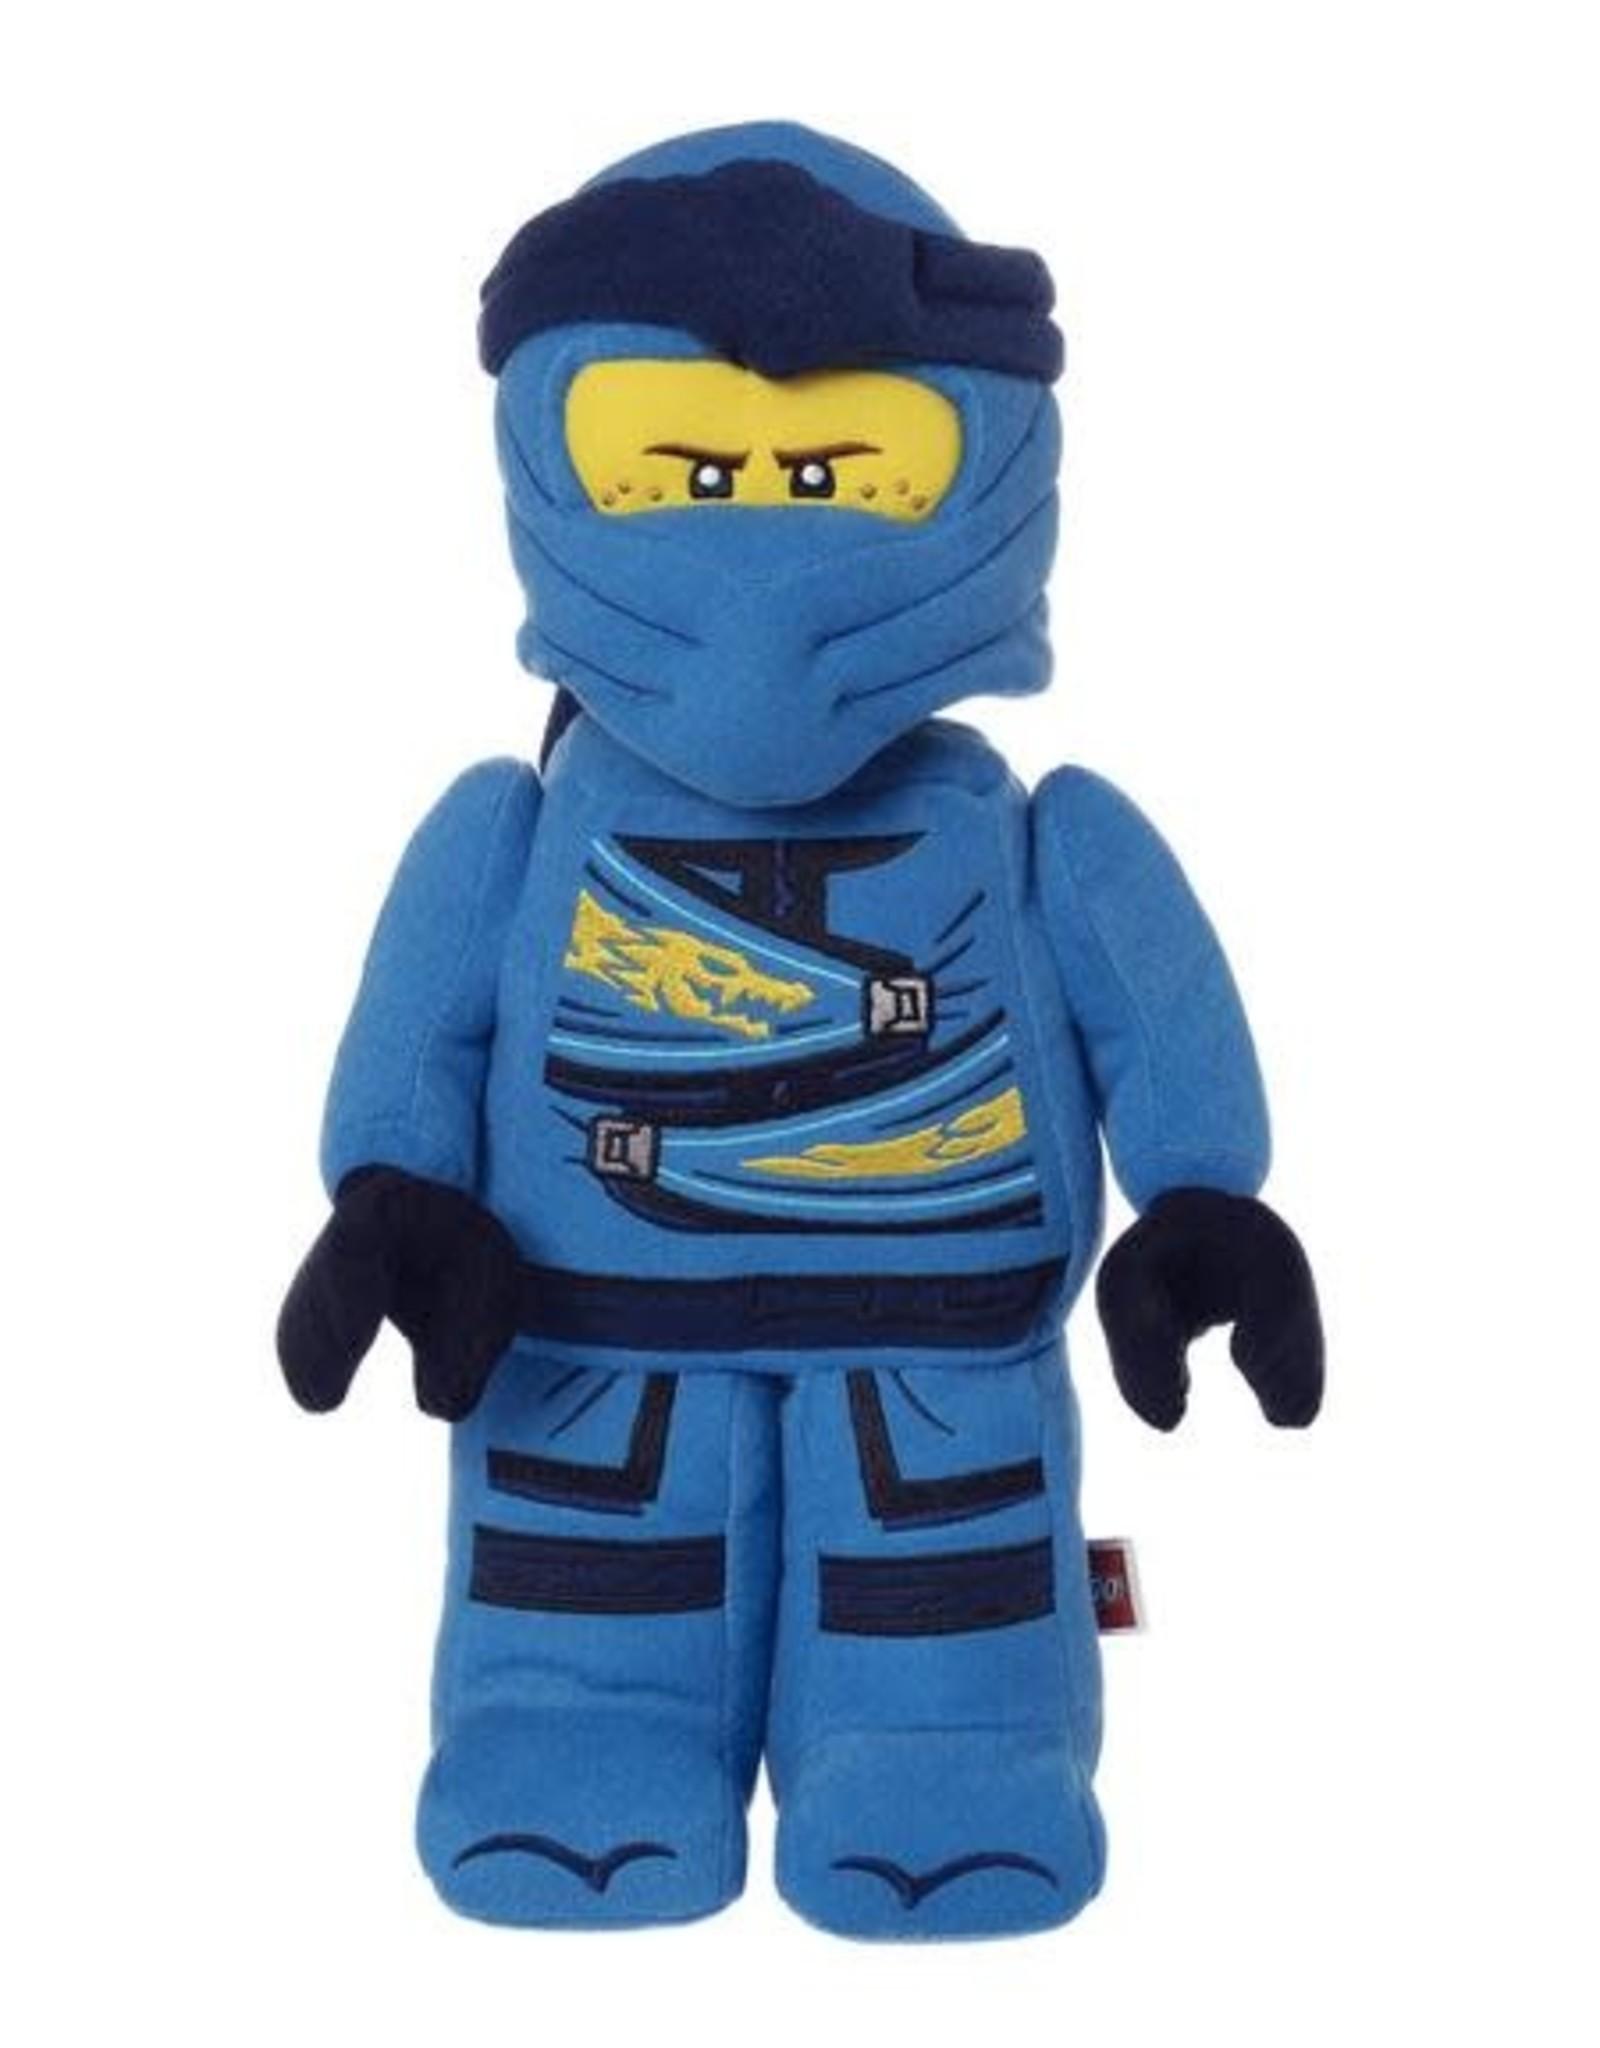 Manhattan Toy Lego Ninjago Jay